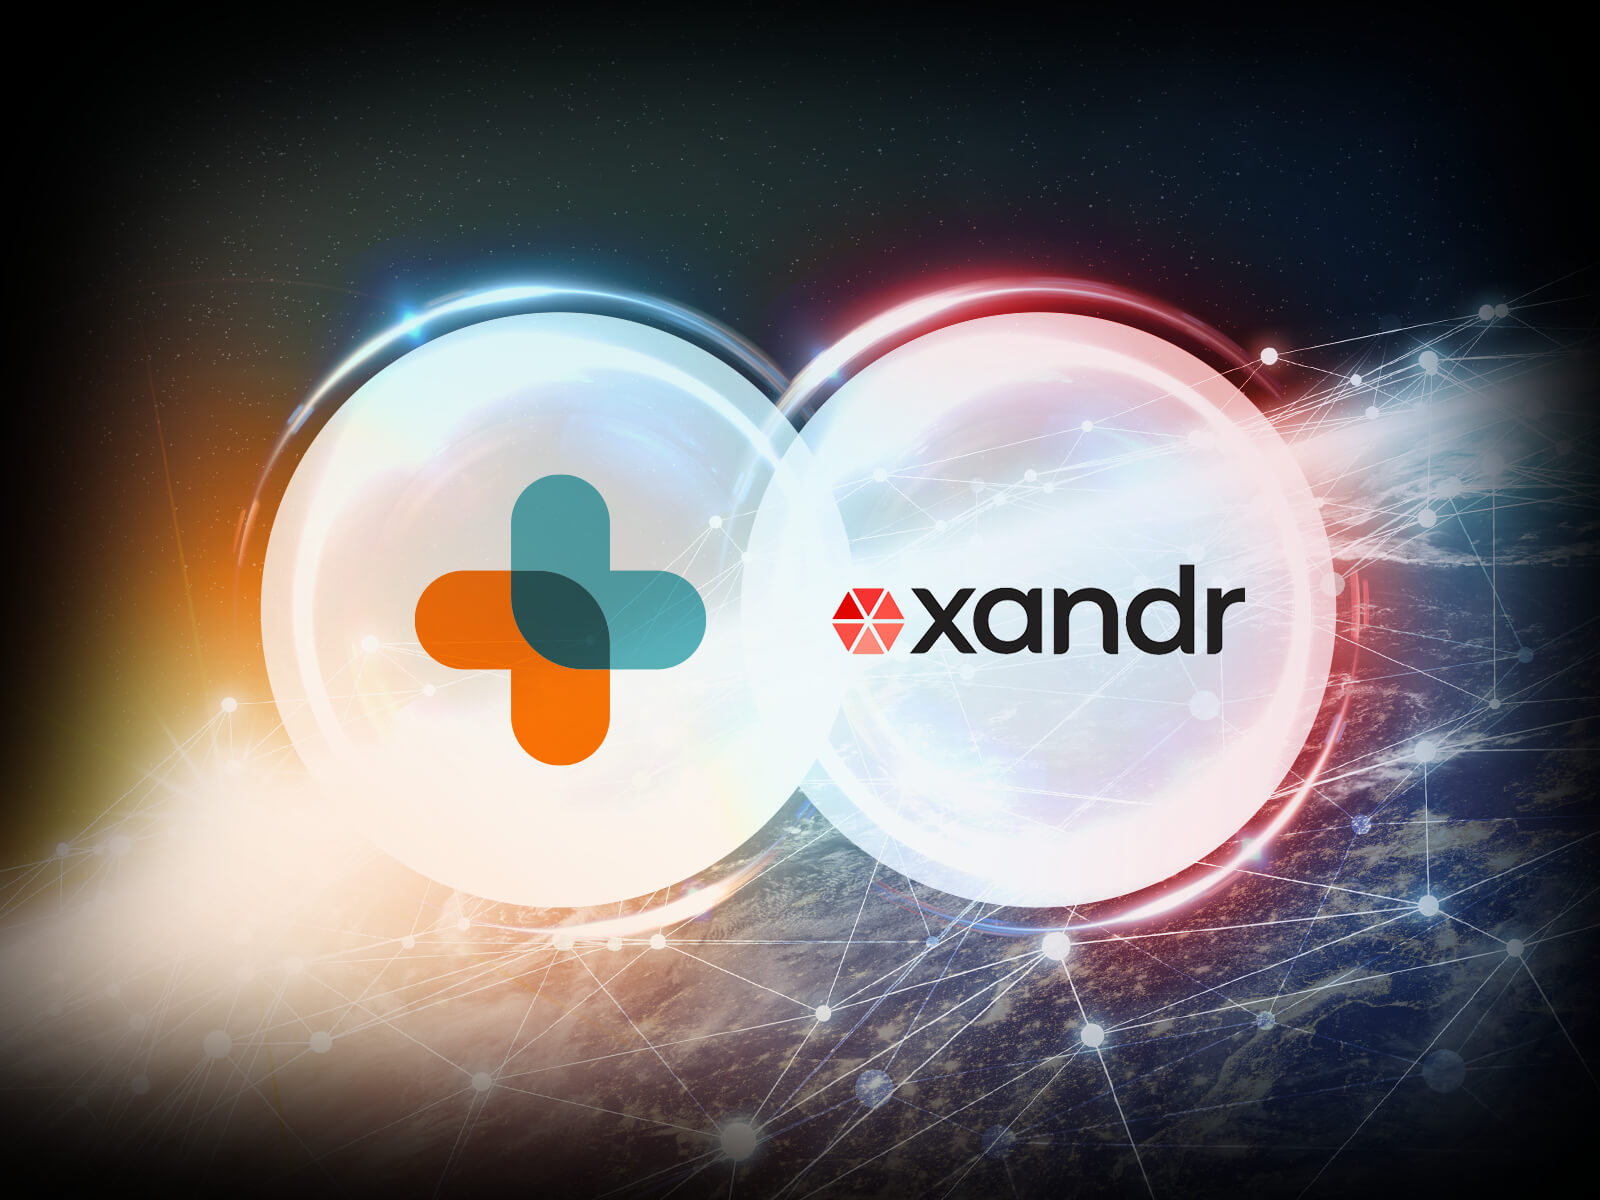 Xandr makes minority investment in InfoSum